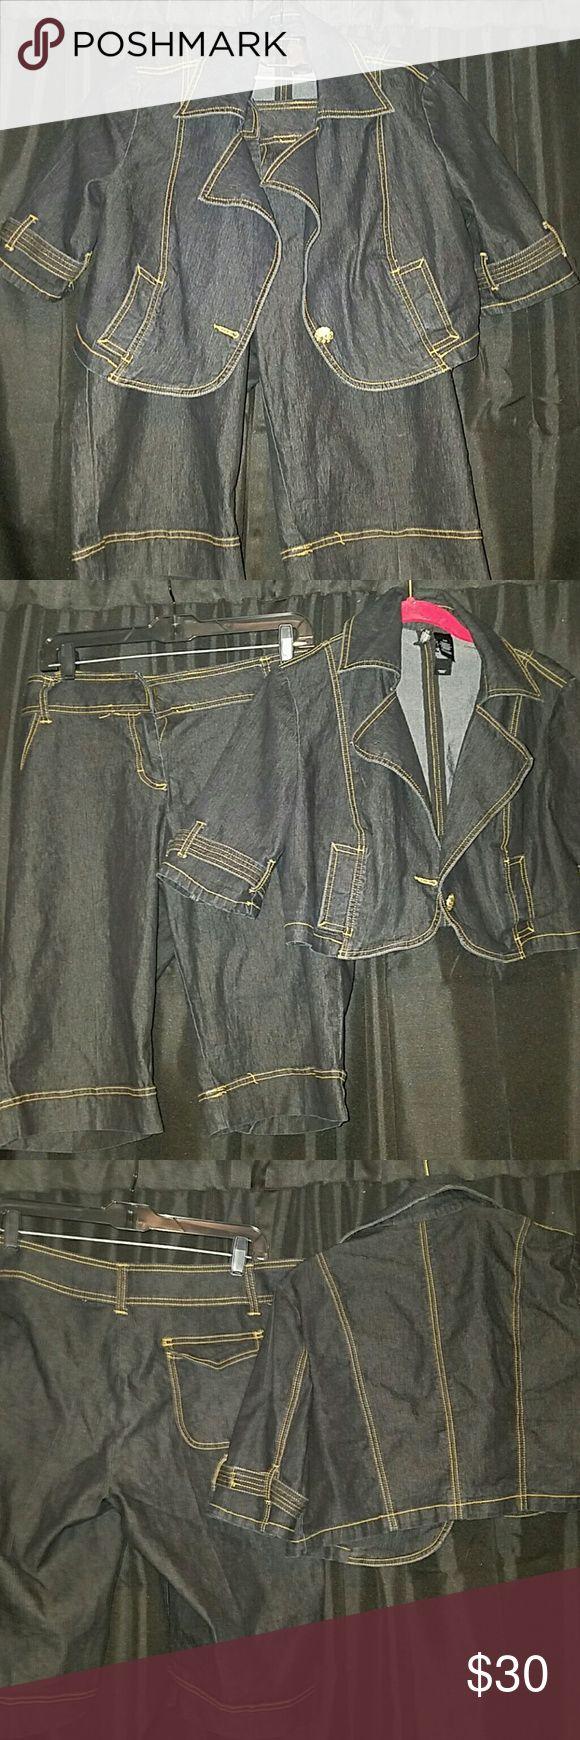 Bisou Bisou  Jean short suit Light jeans fits nice Bisou Bisou Shorts Jean Shorts